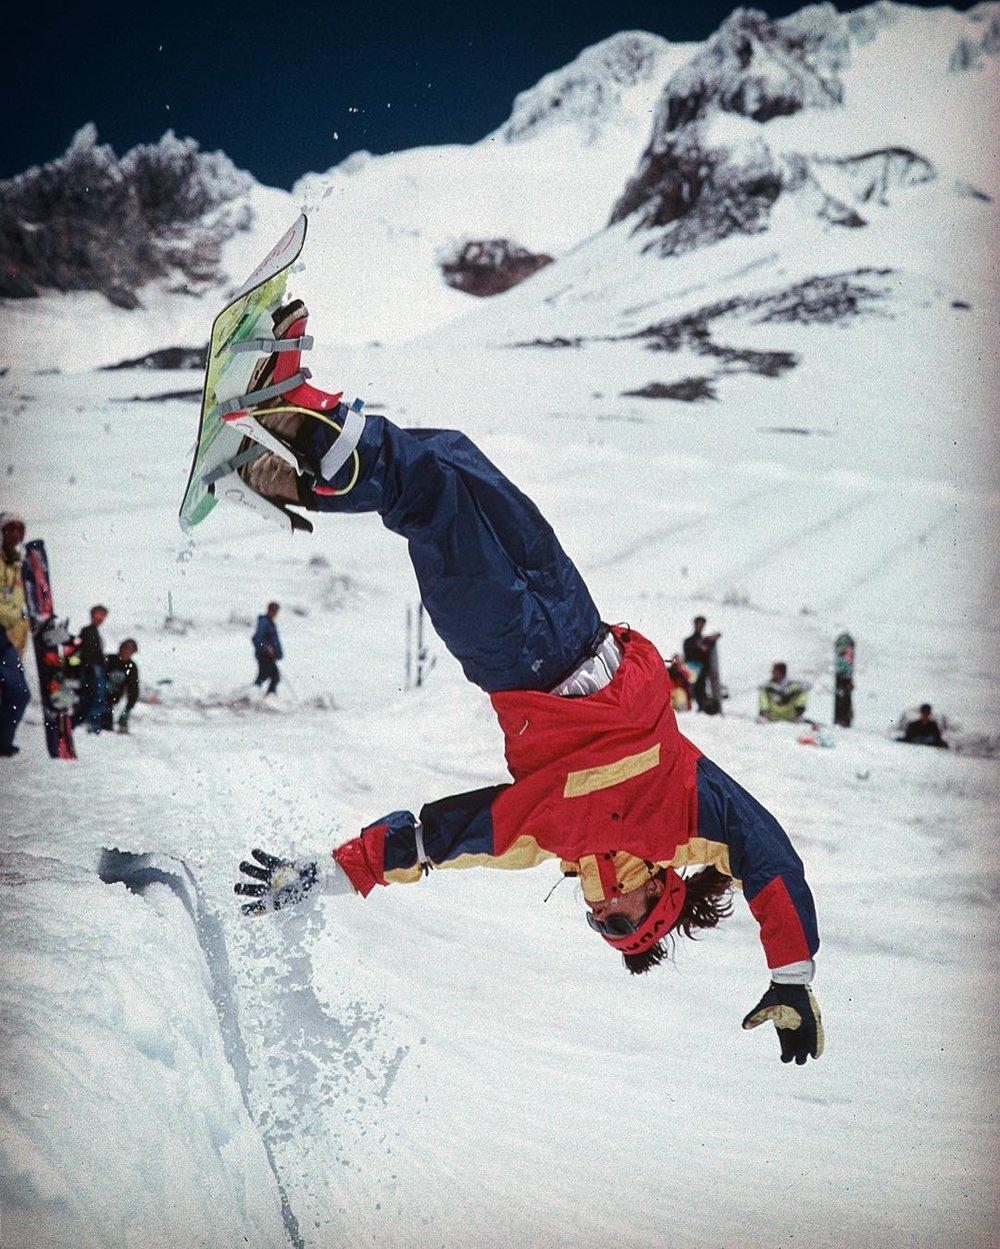 Karol Snowboarding camp - 1988 / On Snow 1989. Chris karol.Jean Higgins by (please contact us)